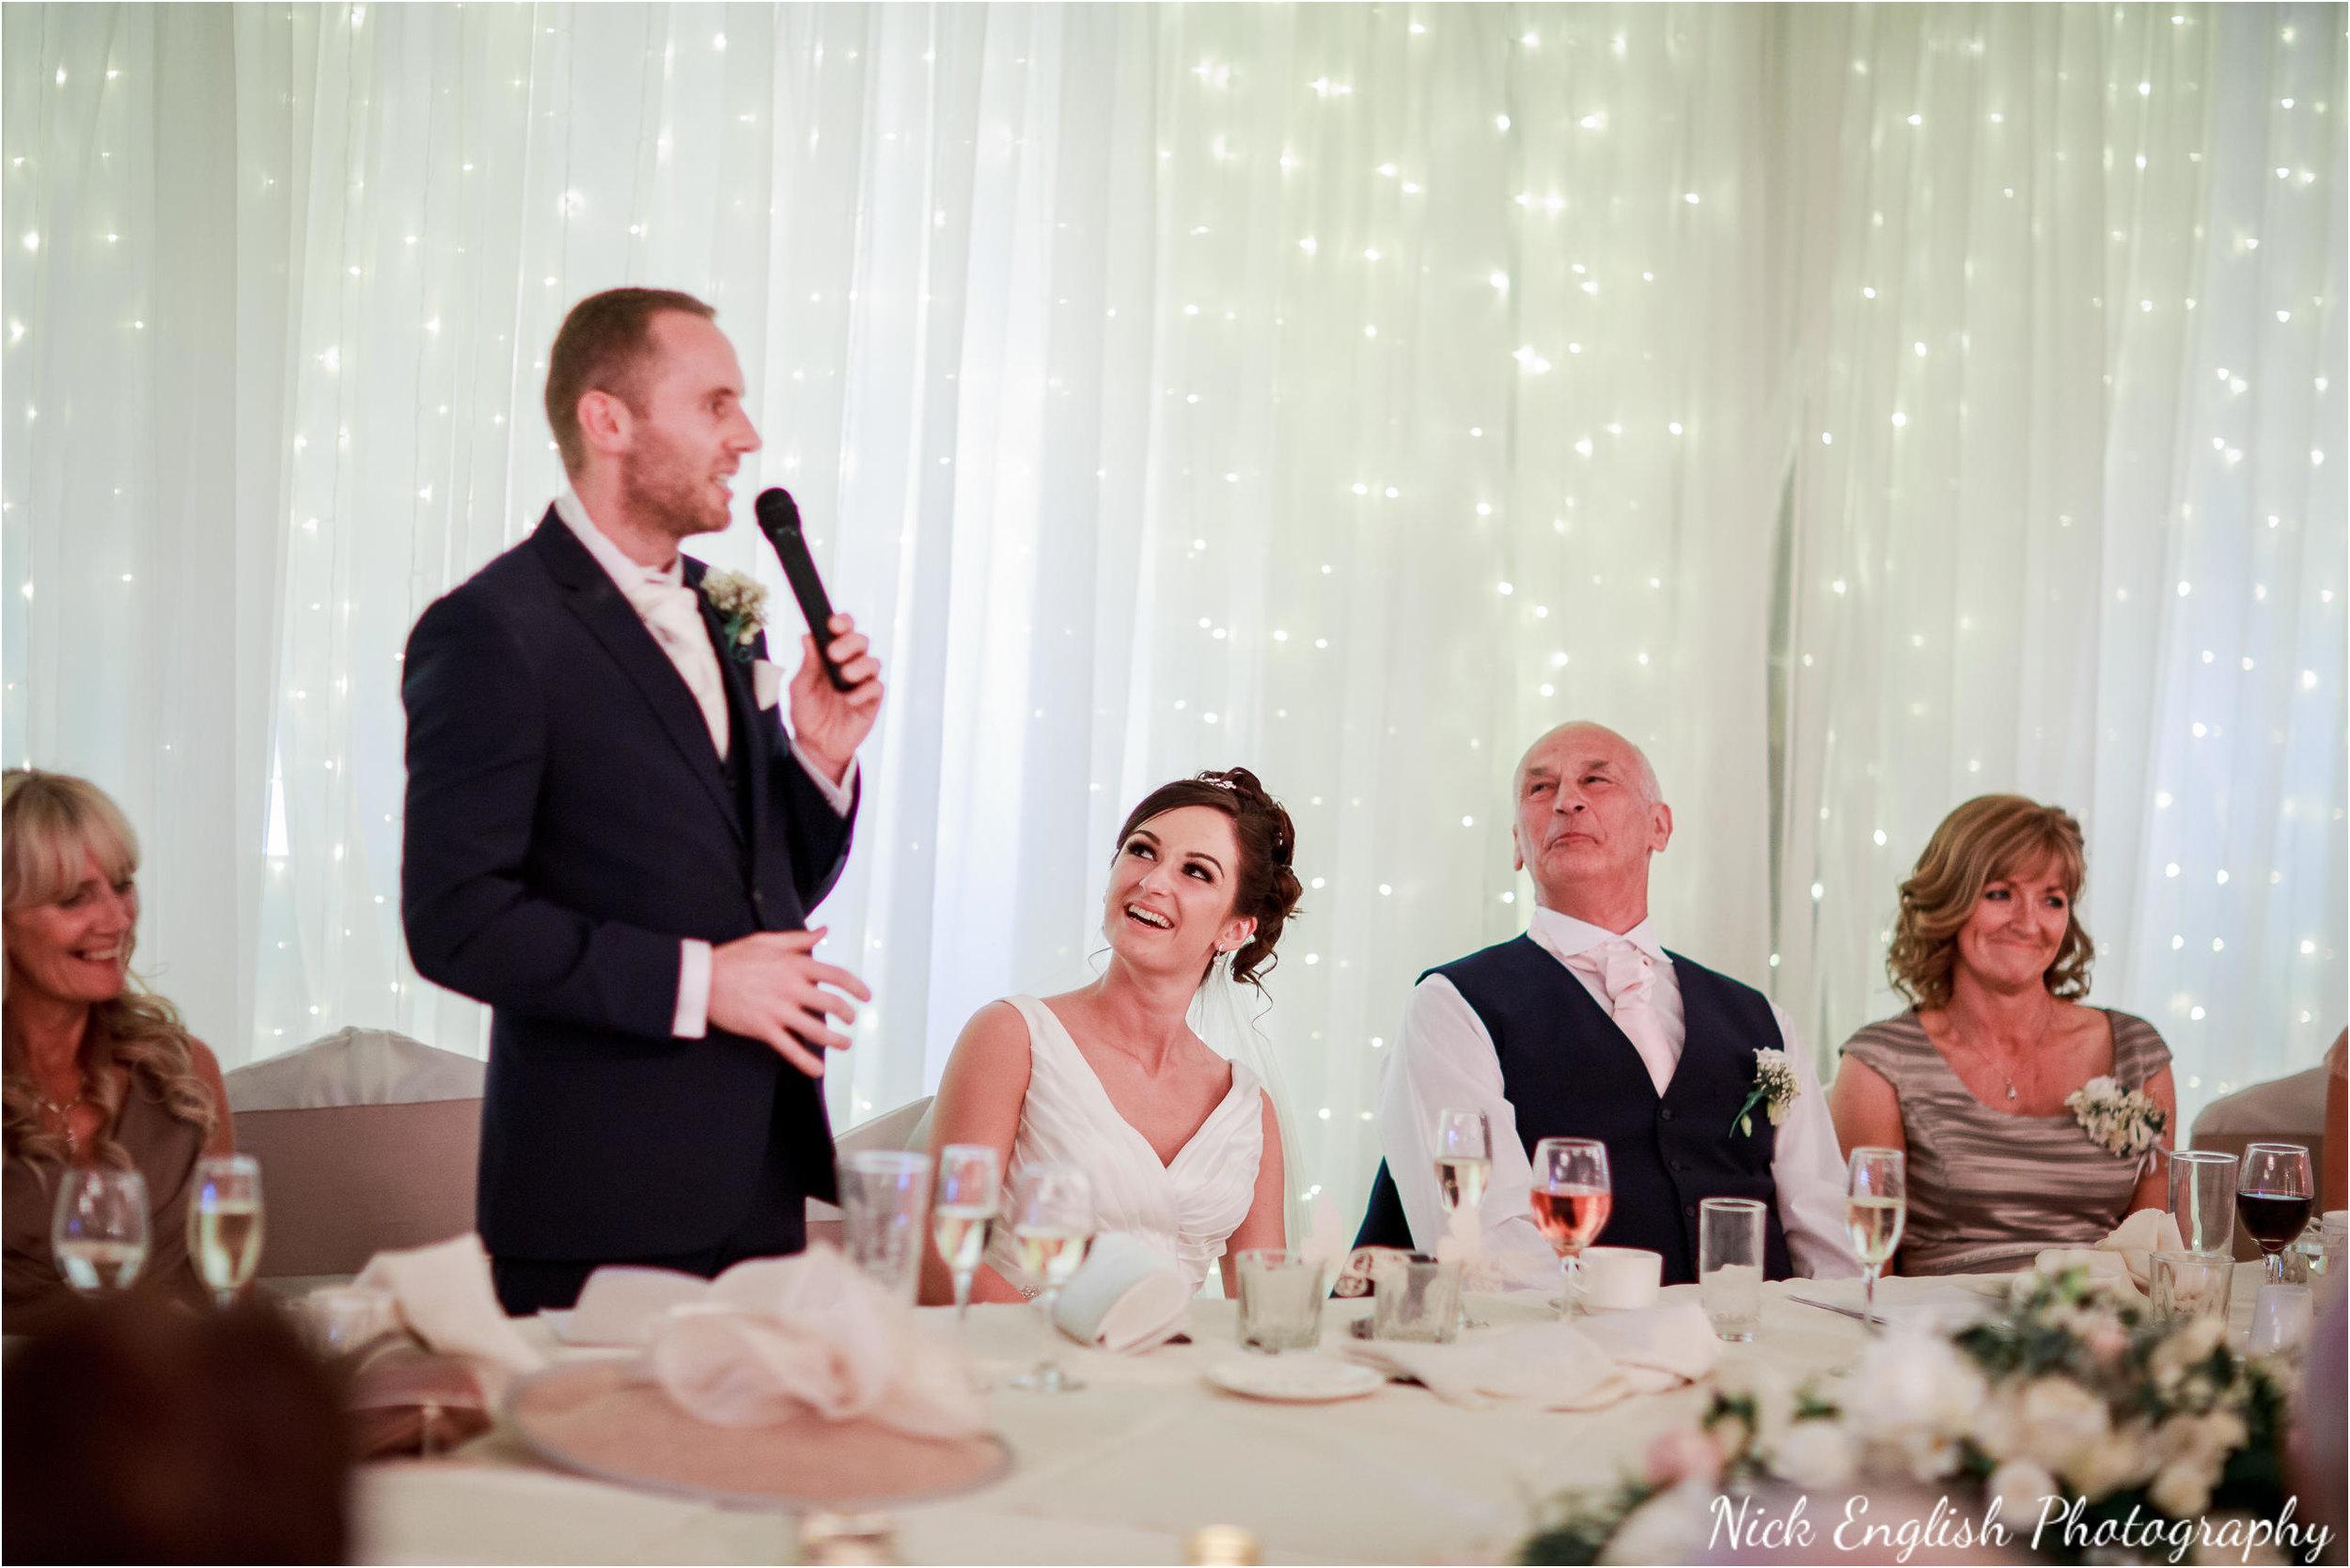 Emily David Wedding Photographs at Barton Grange Preston by Nick English Photography 171jpg.jpeg